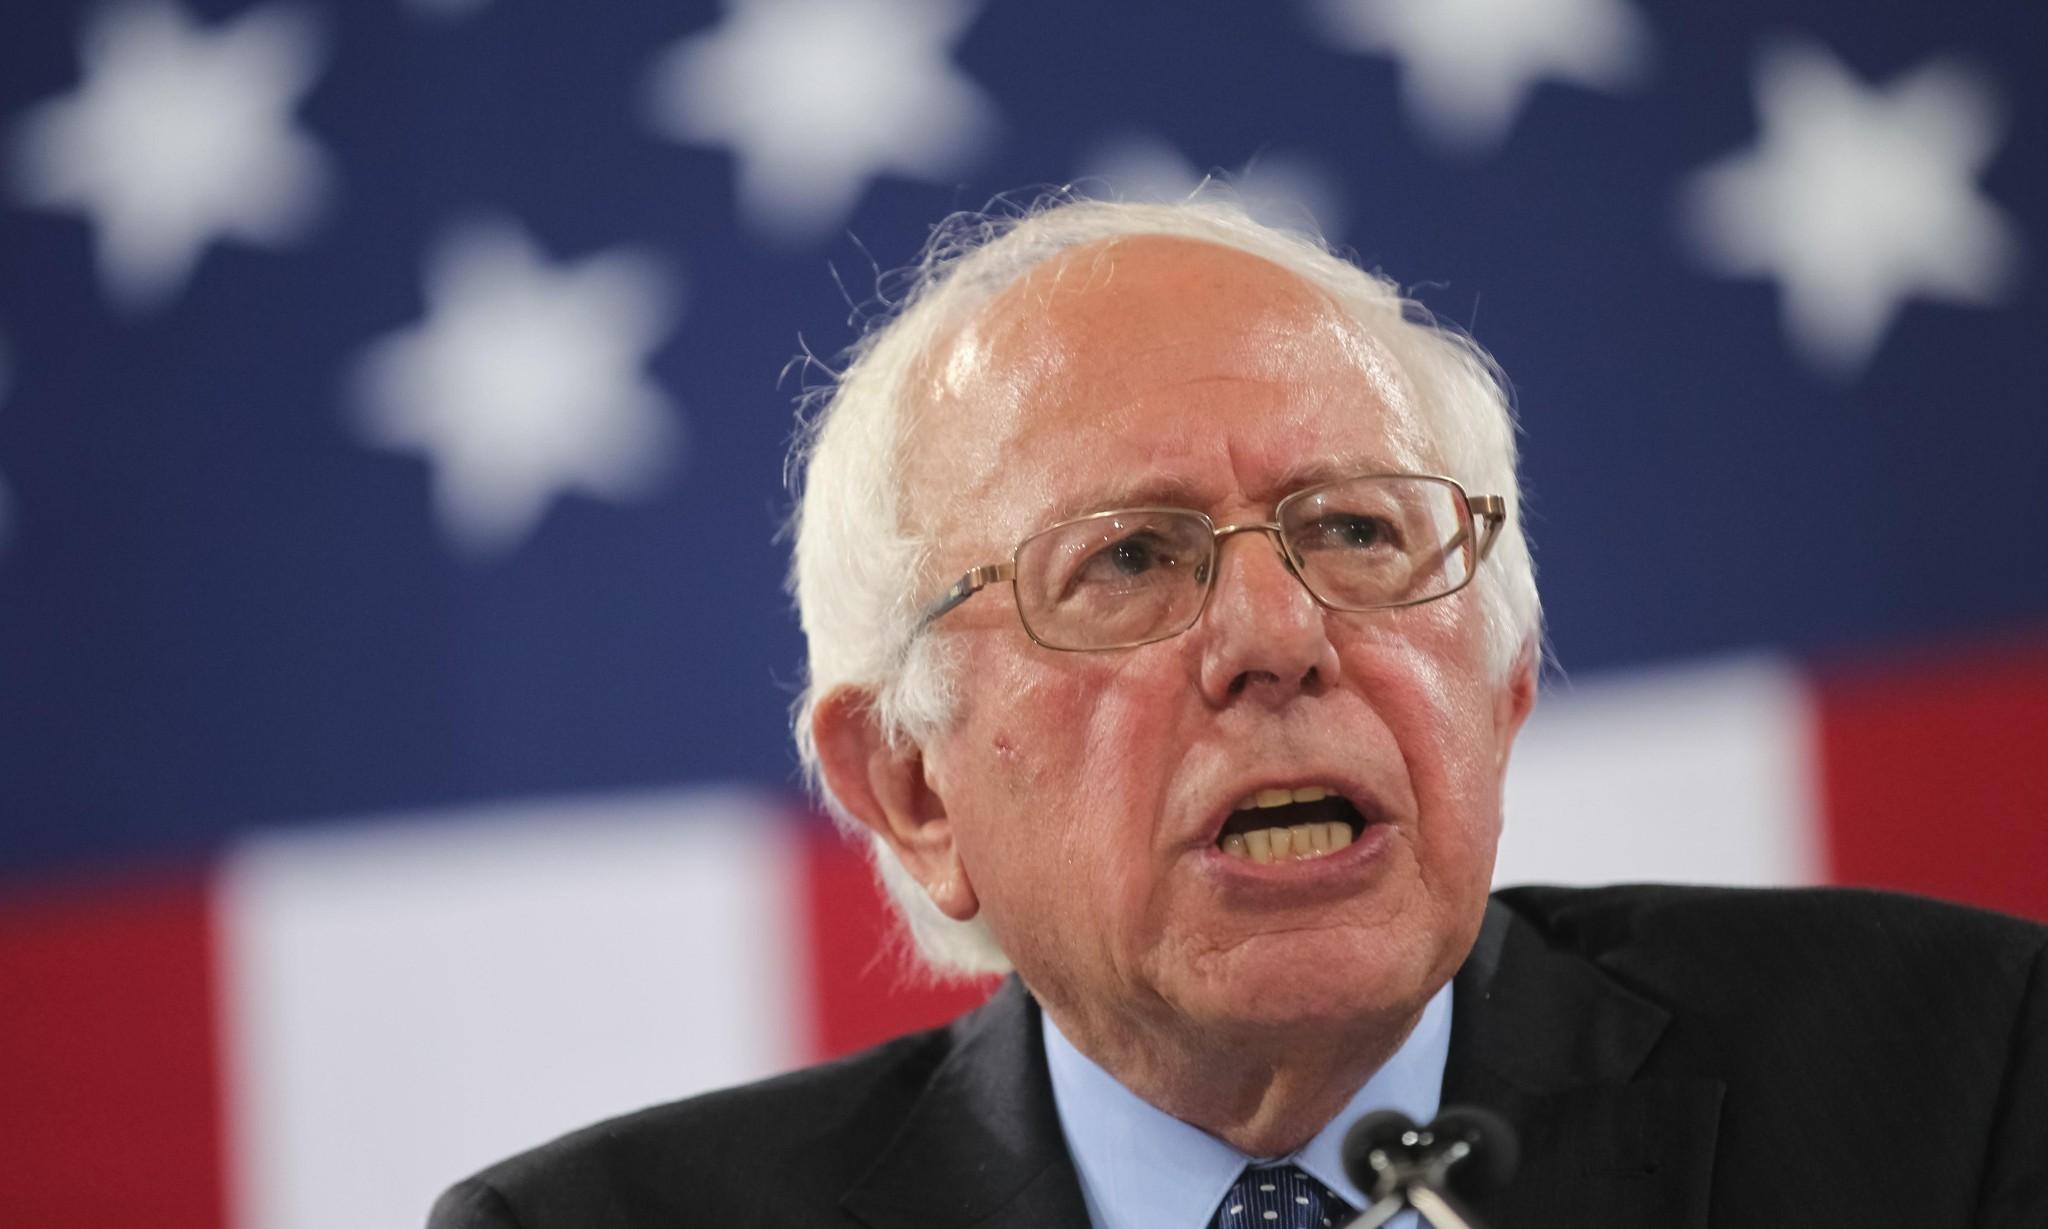 Bernie Sanders unveils universal healthcare bill: 'We will win this struggle'